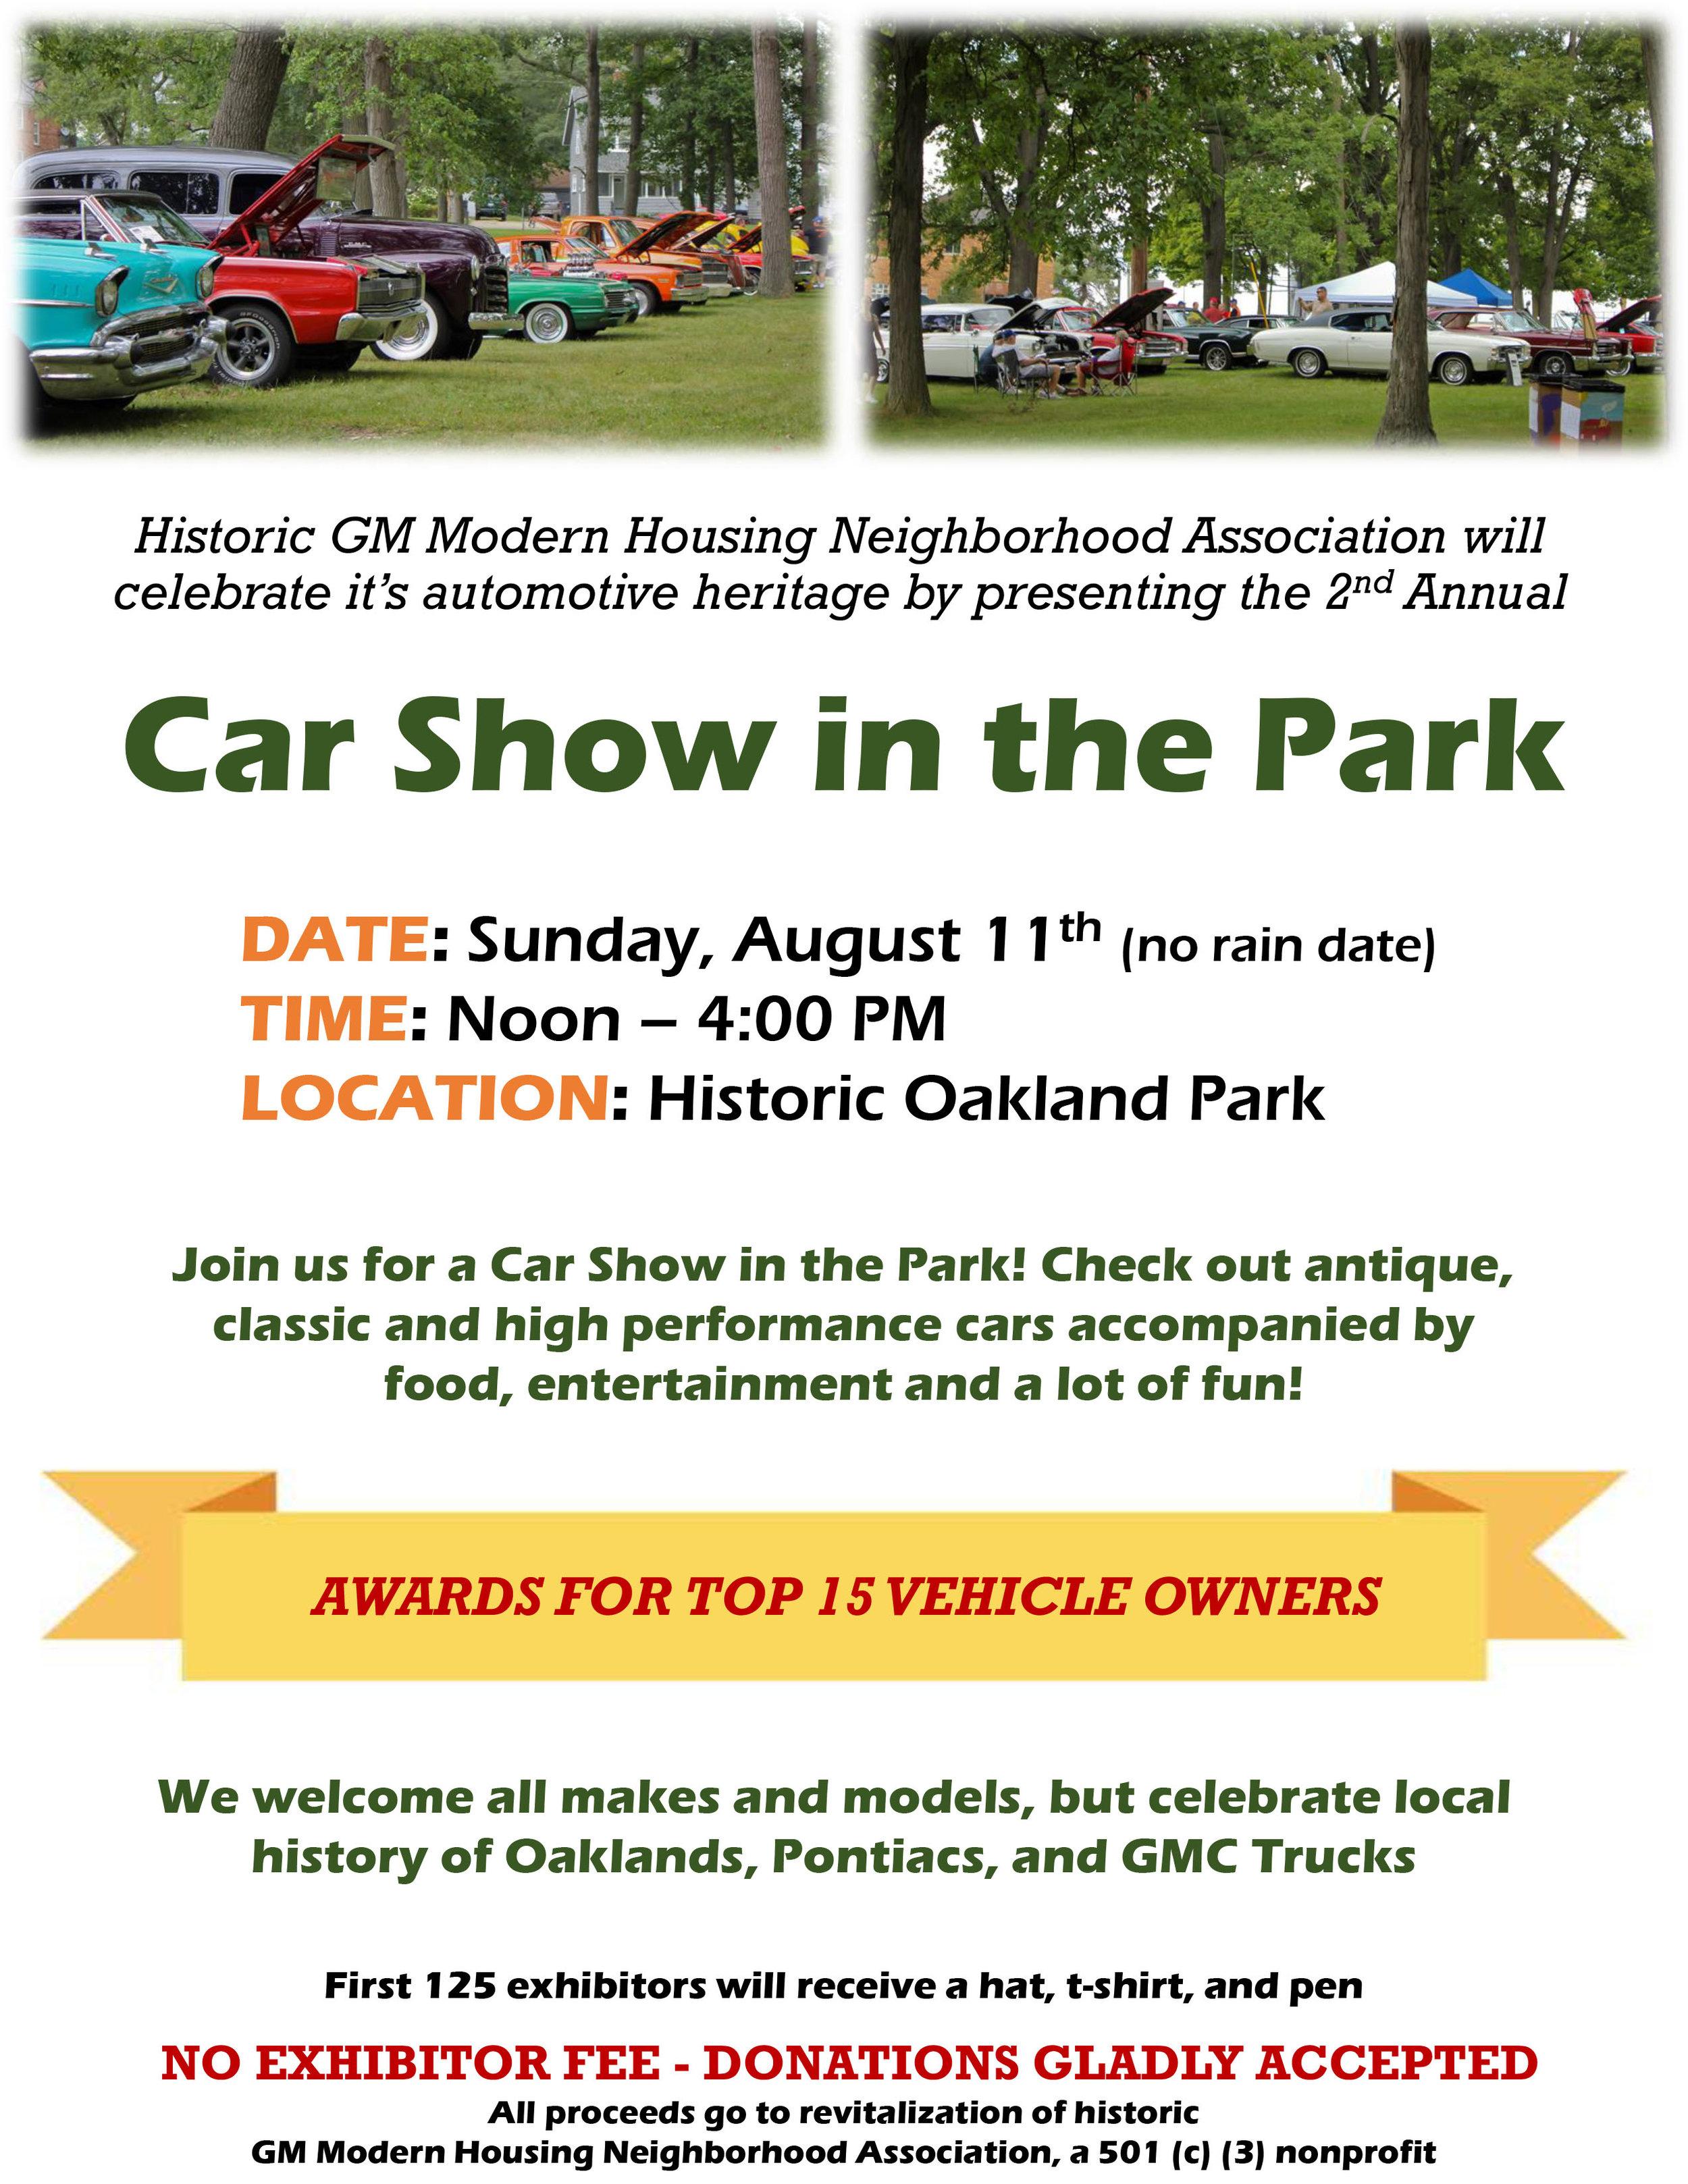 Car Show in the Park Flyer 2019-1.jpg